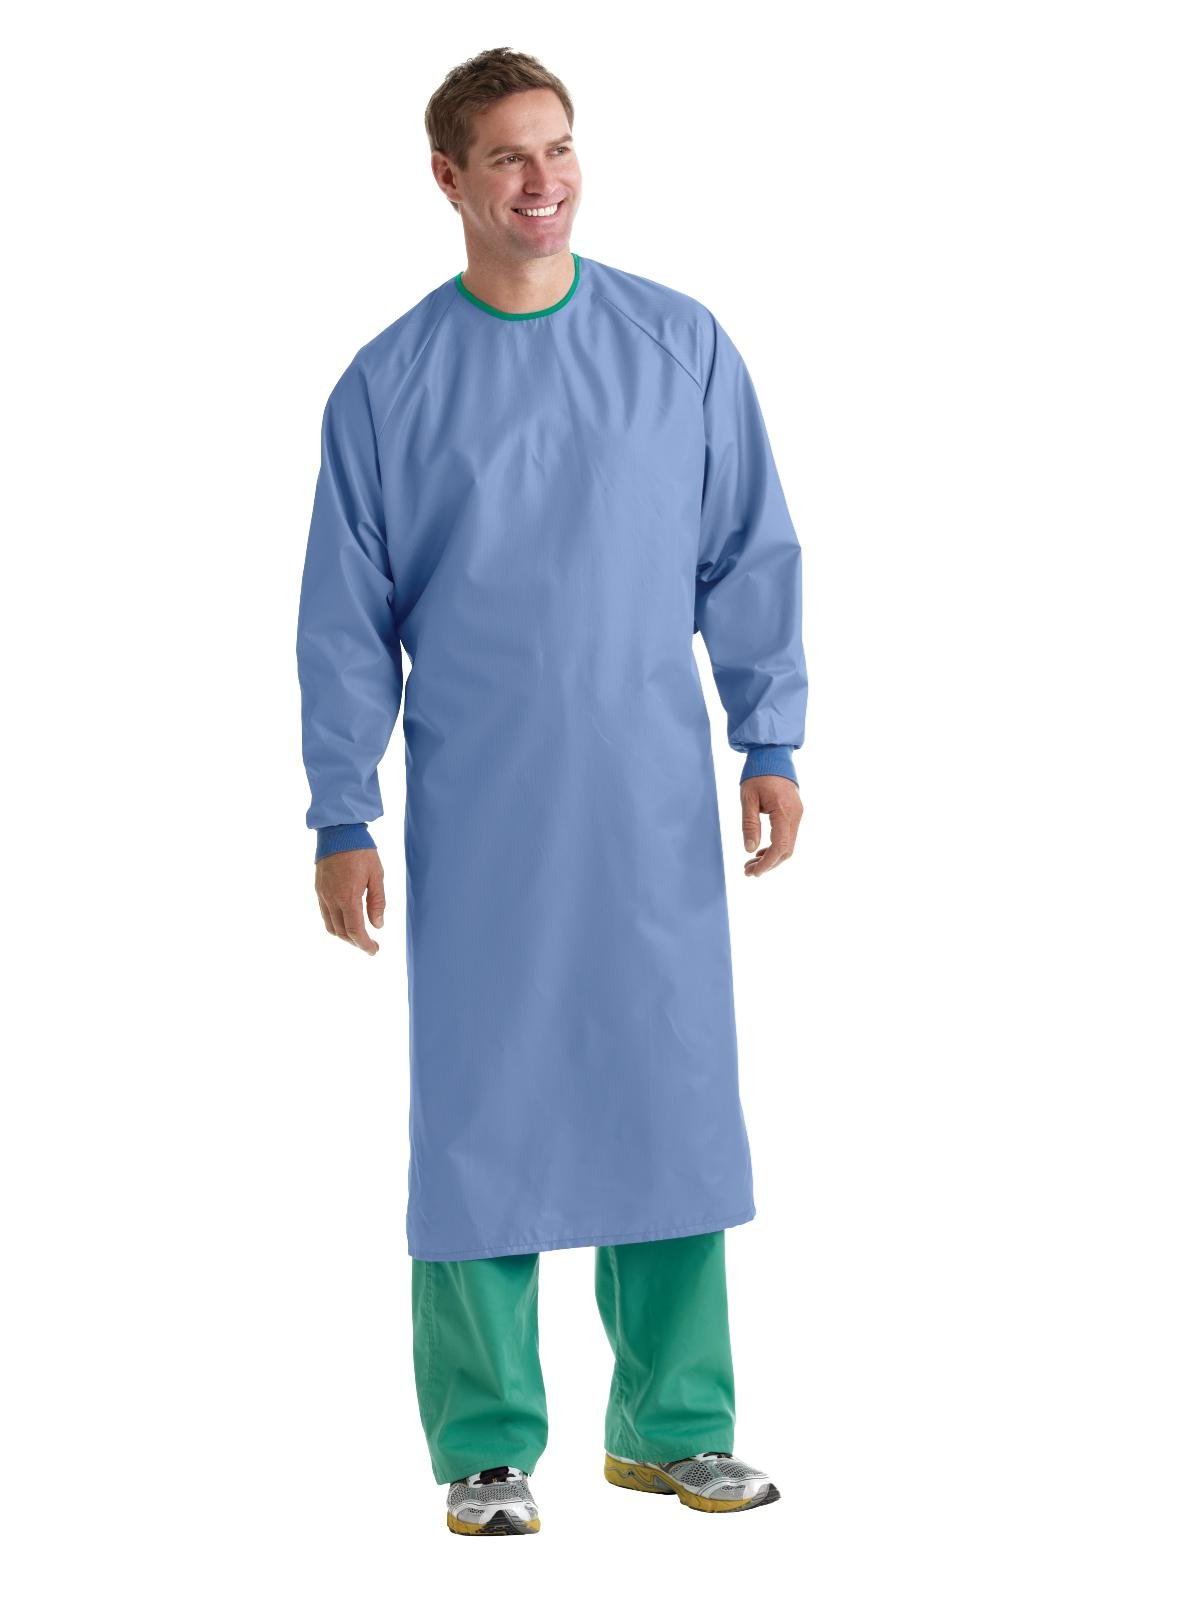 Medline MDT012090L 1-Ply Blockade AngelStat Surgical Gown, Tie Neck and Back Closure, Non Sterile, Large, Ceil Blue (Pack of 12) by Medline